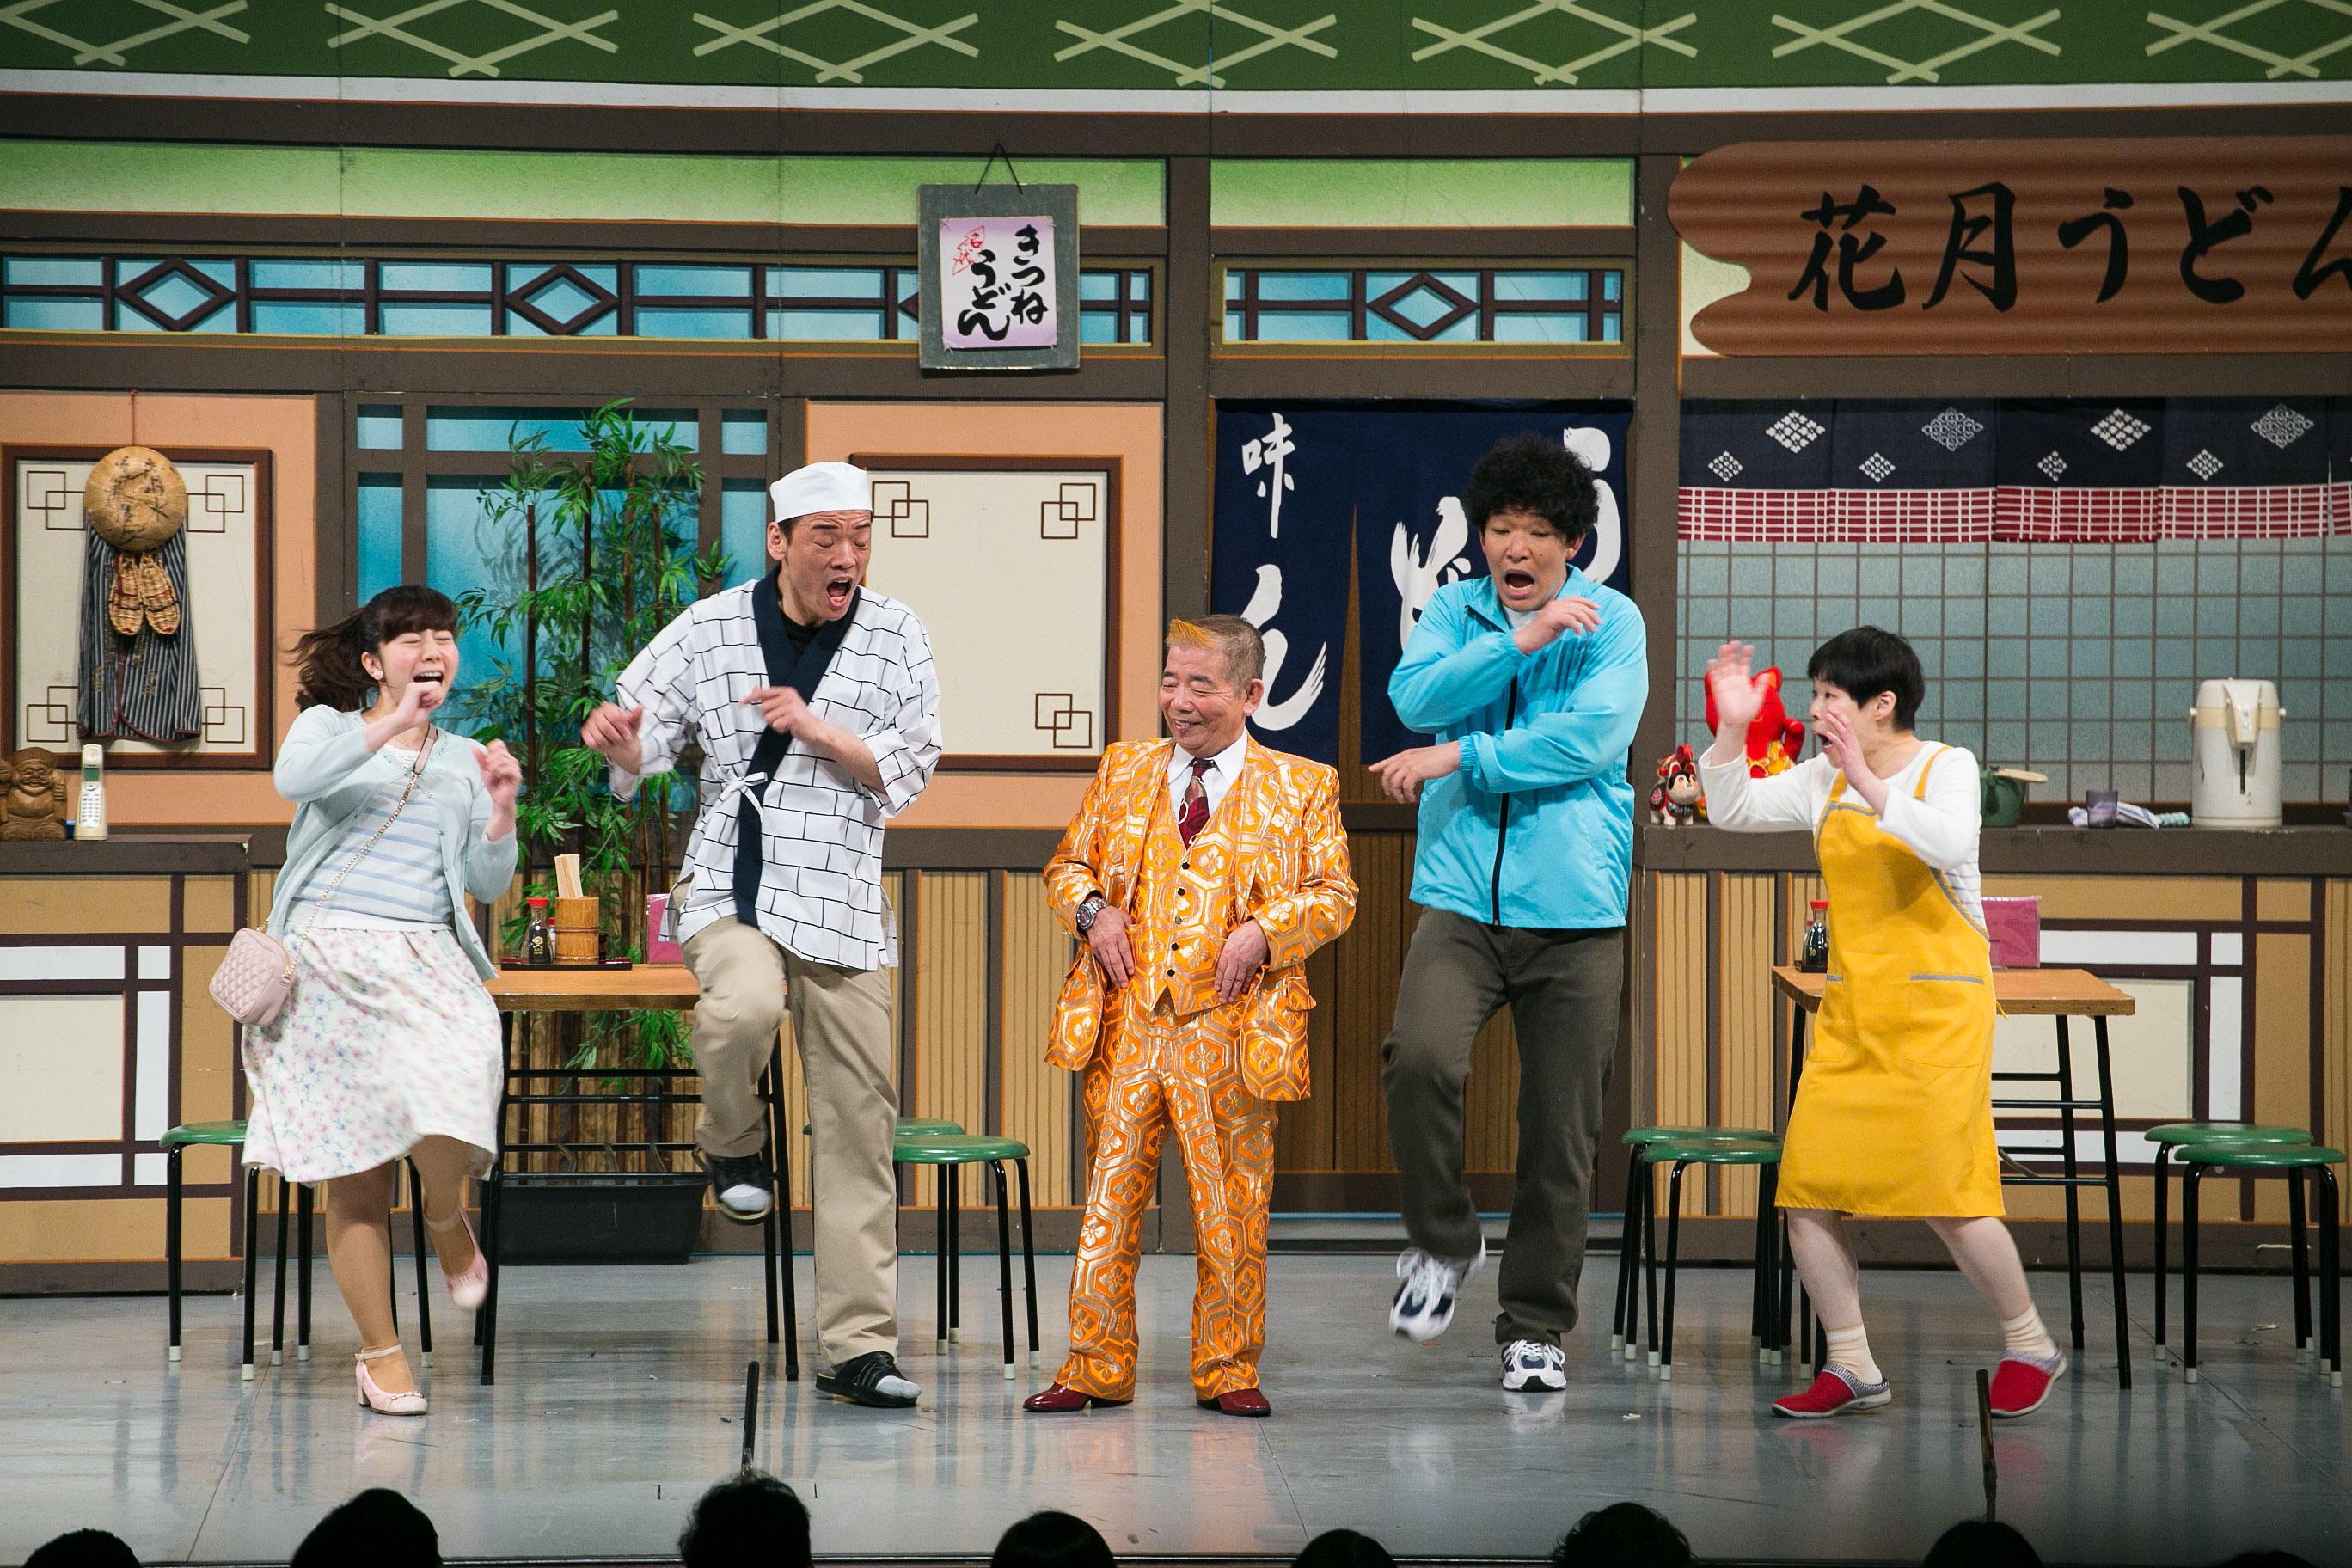 http://news.yoshimoto.co.jp/20180407101701-43558e3495a22d57705e9a9c3e61b250c9044d64.jpg